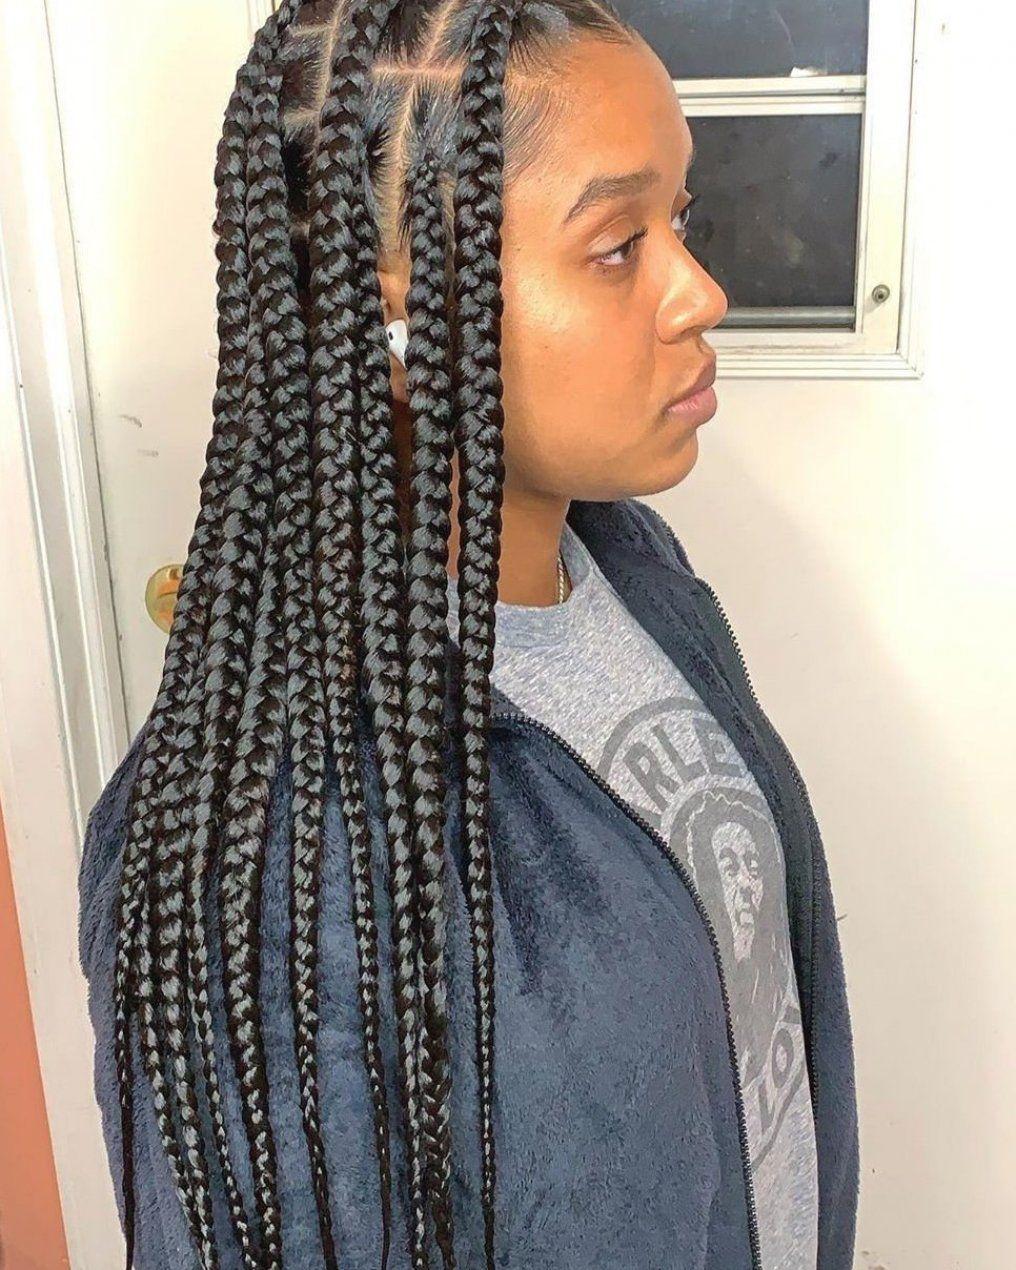 Hair Large Knotless Braids Large Knotless Box Braids Black Girl Braids Goddess Braids Br In 2020 Braids With Curls Box Braids Medium Length Colored Box Braids